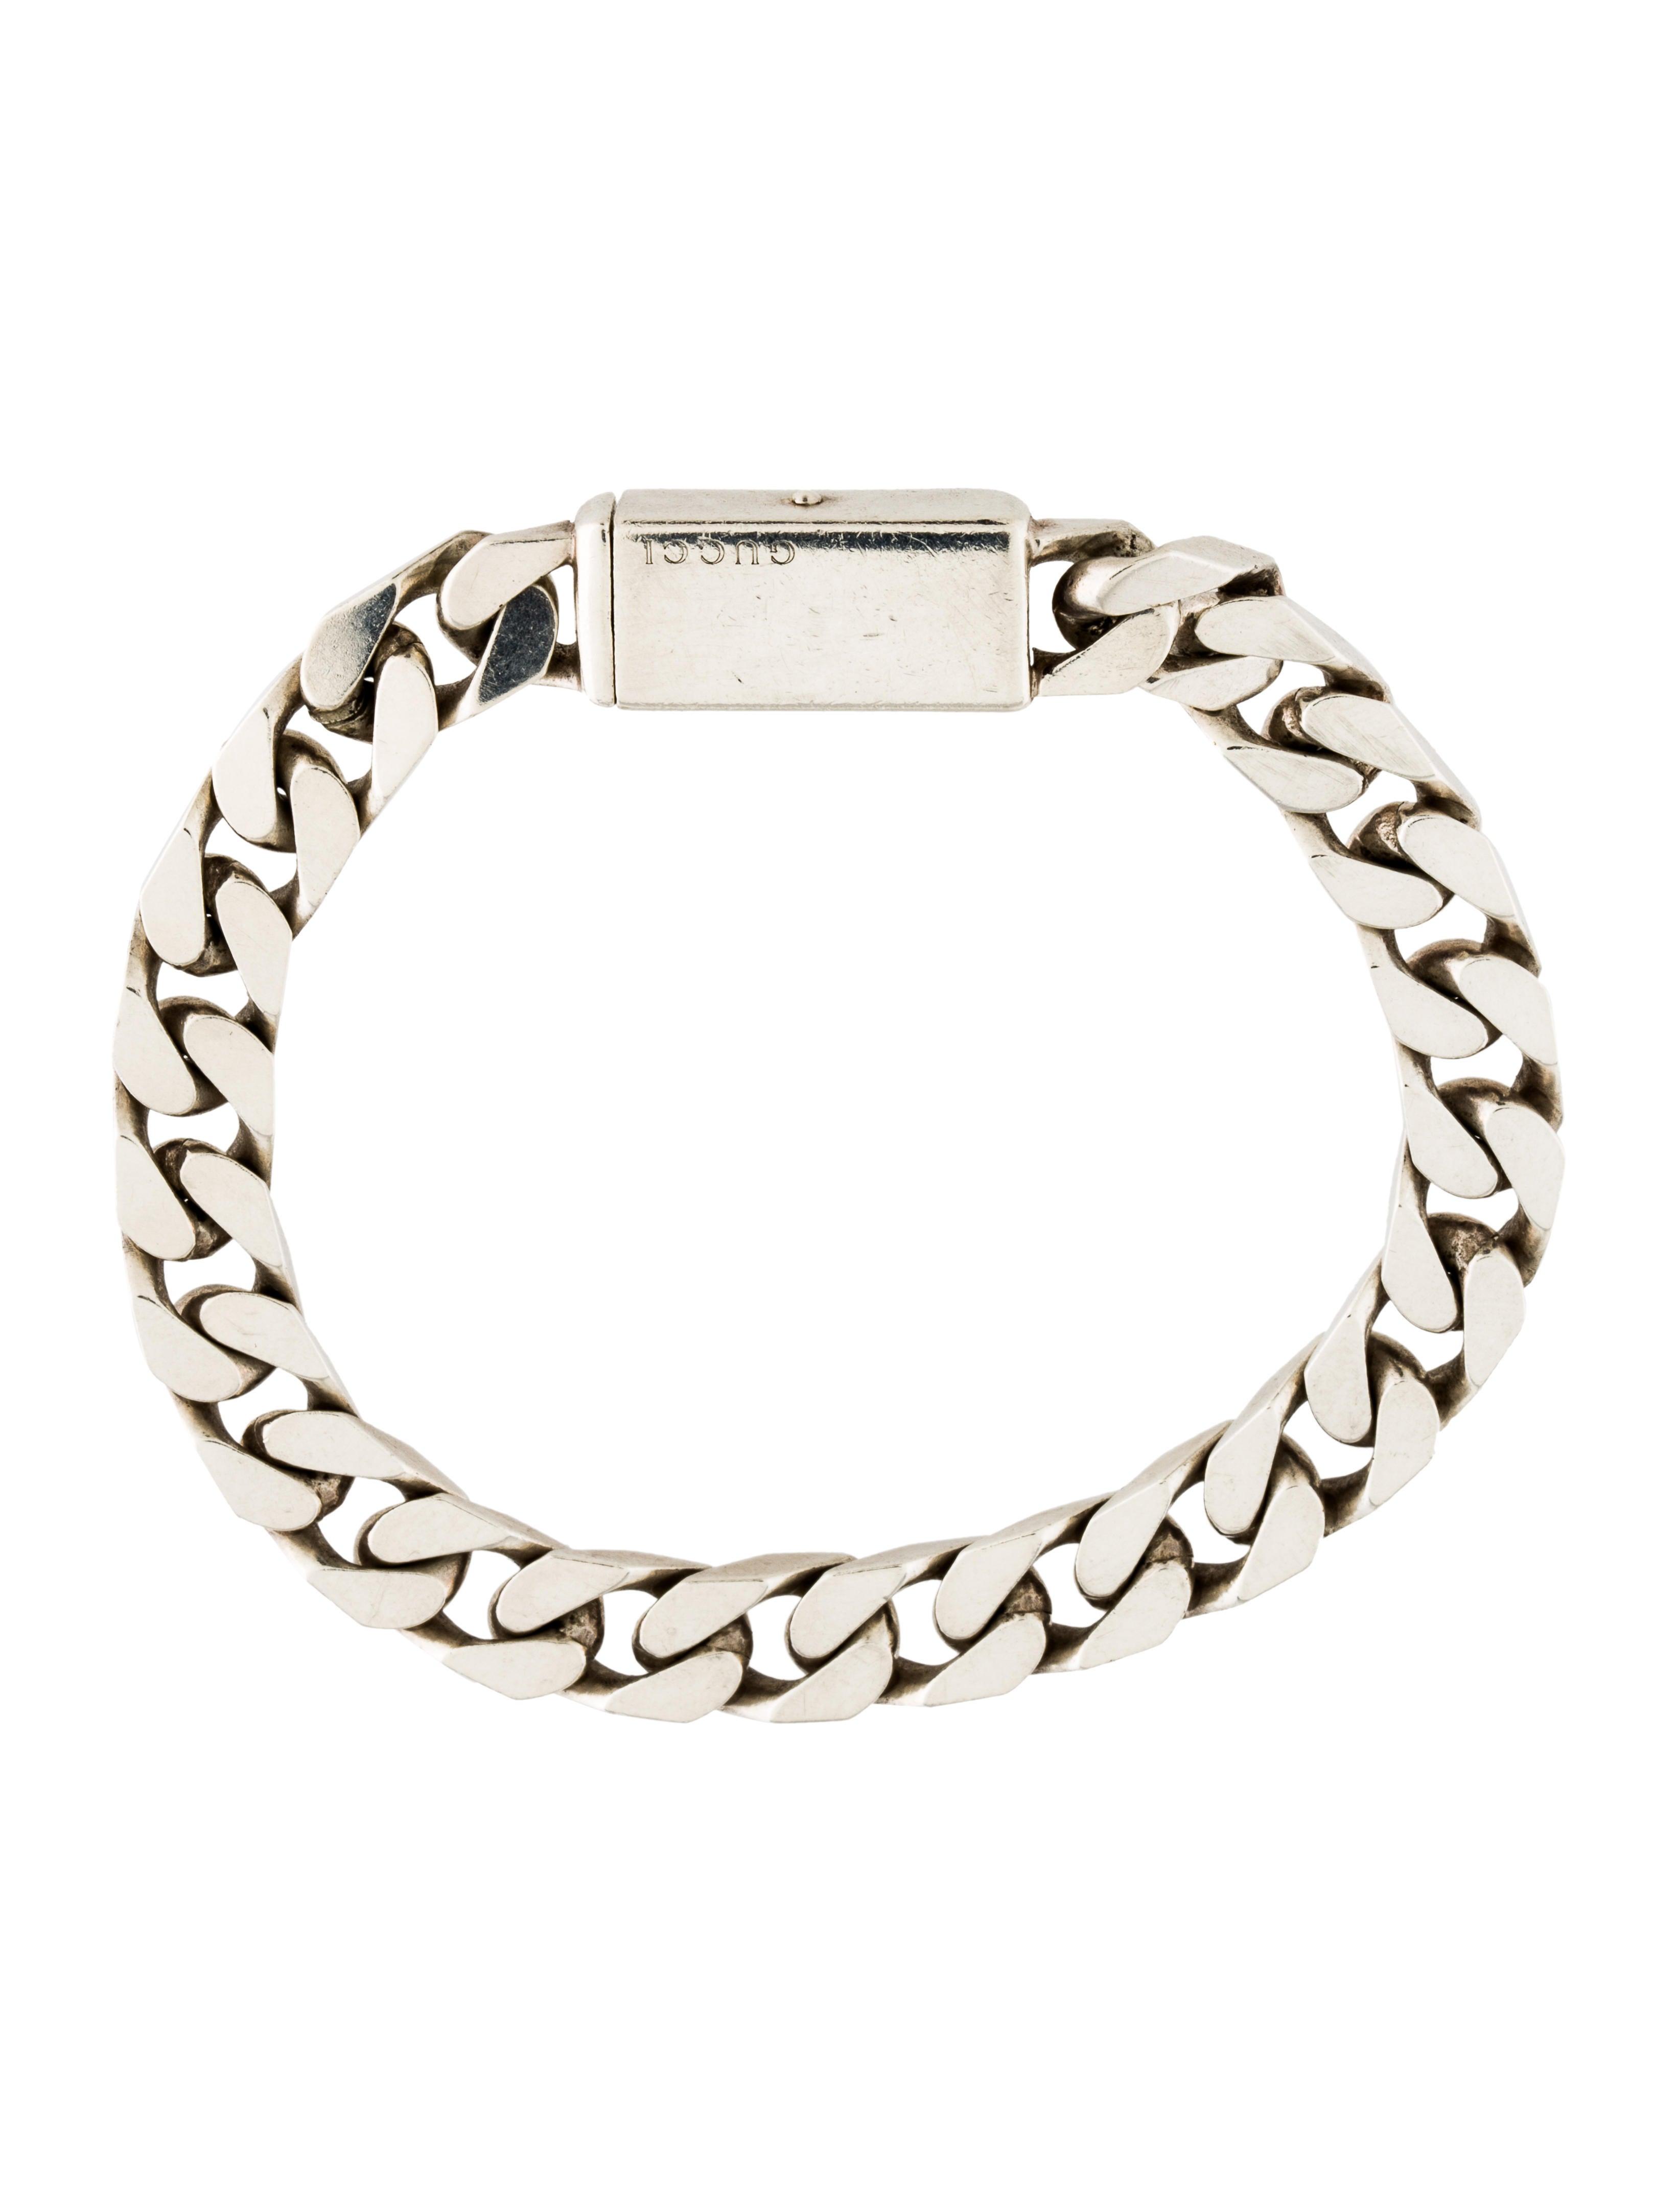 Gucci Curb Chain Bracelet